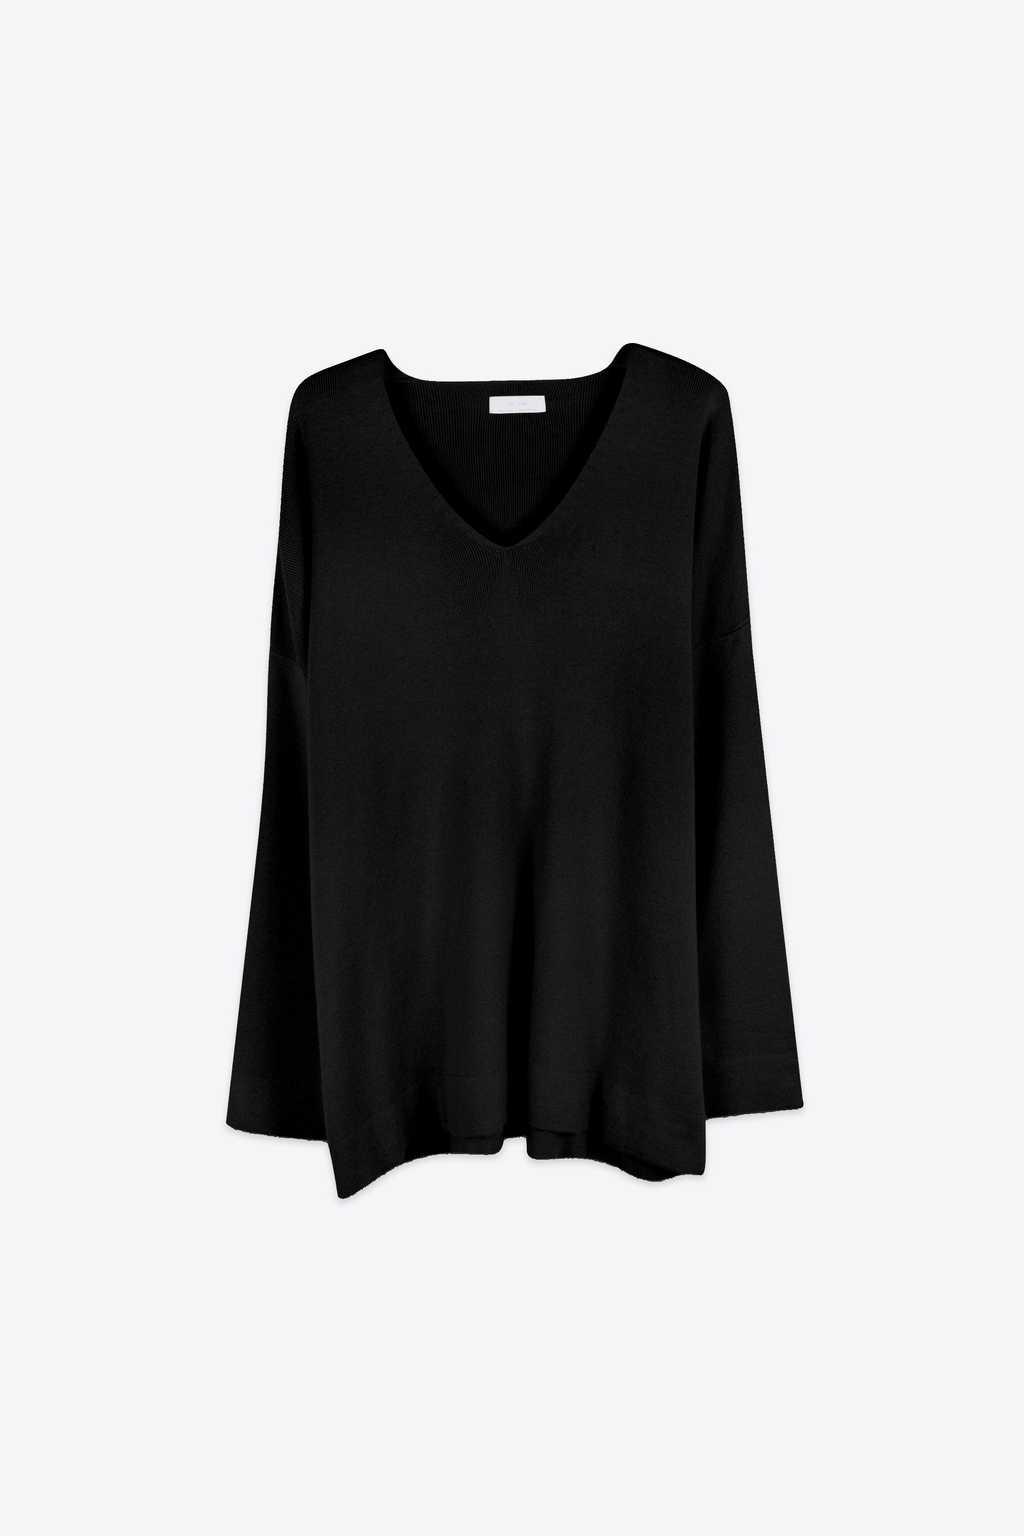 Sweater 1468 Black 9